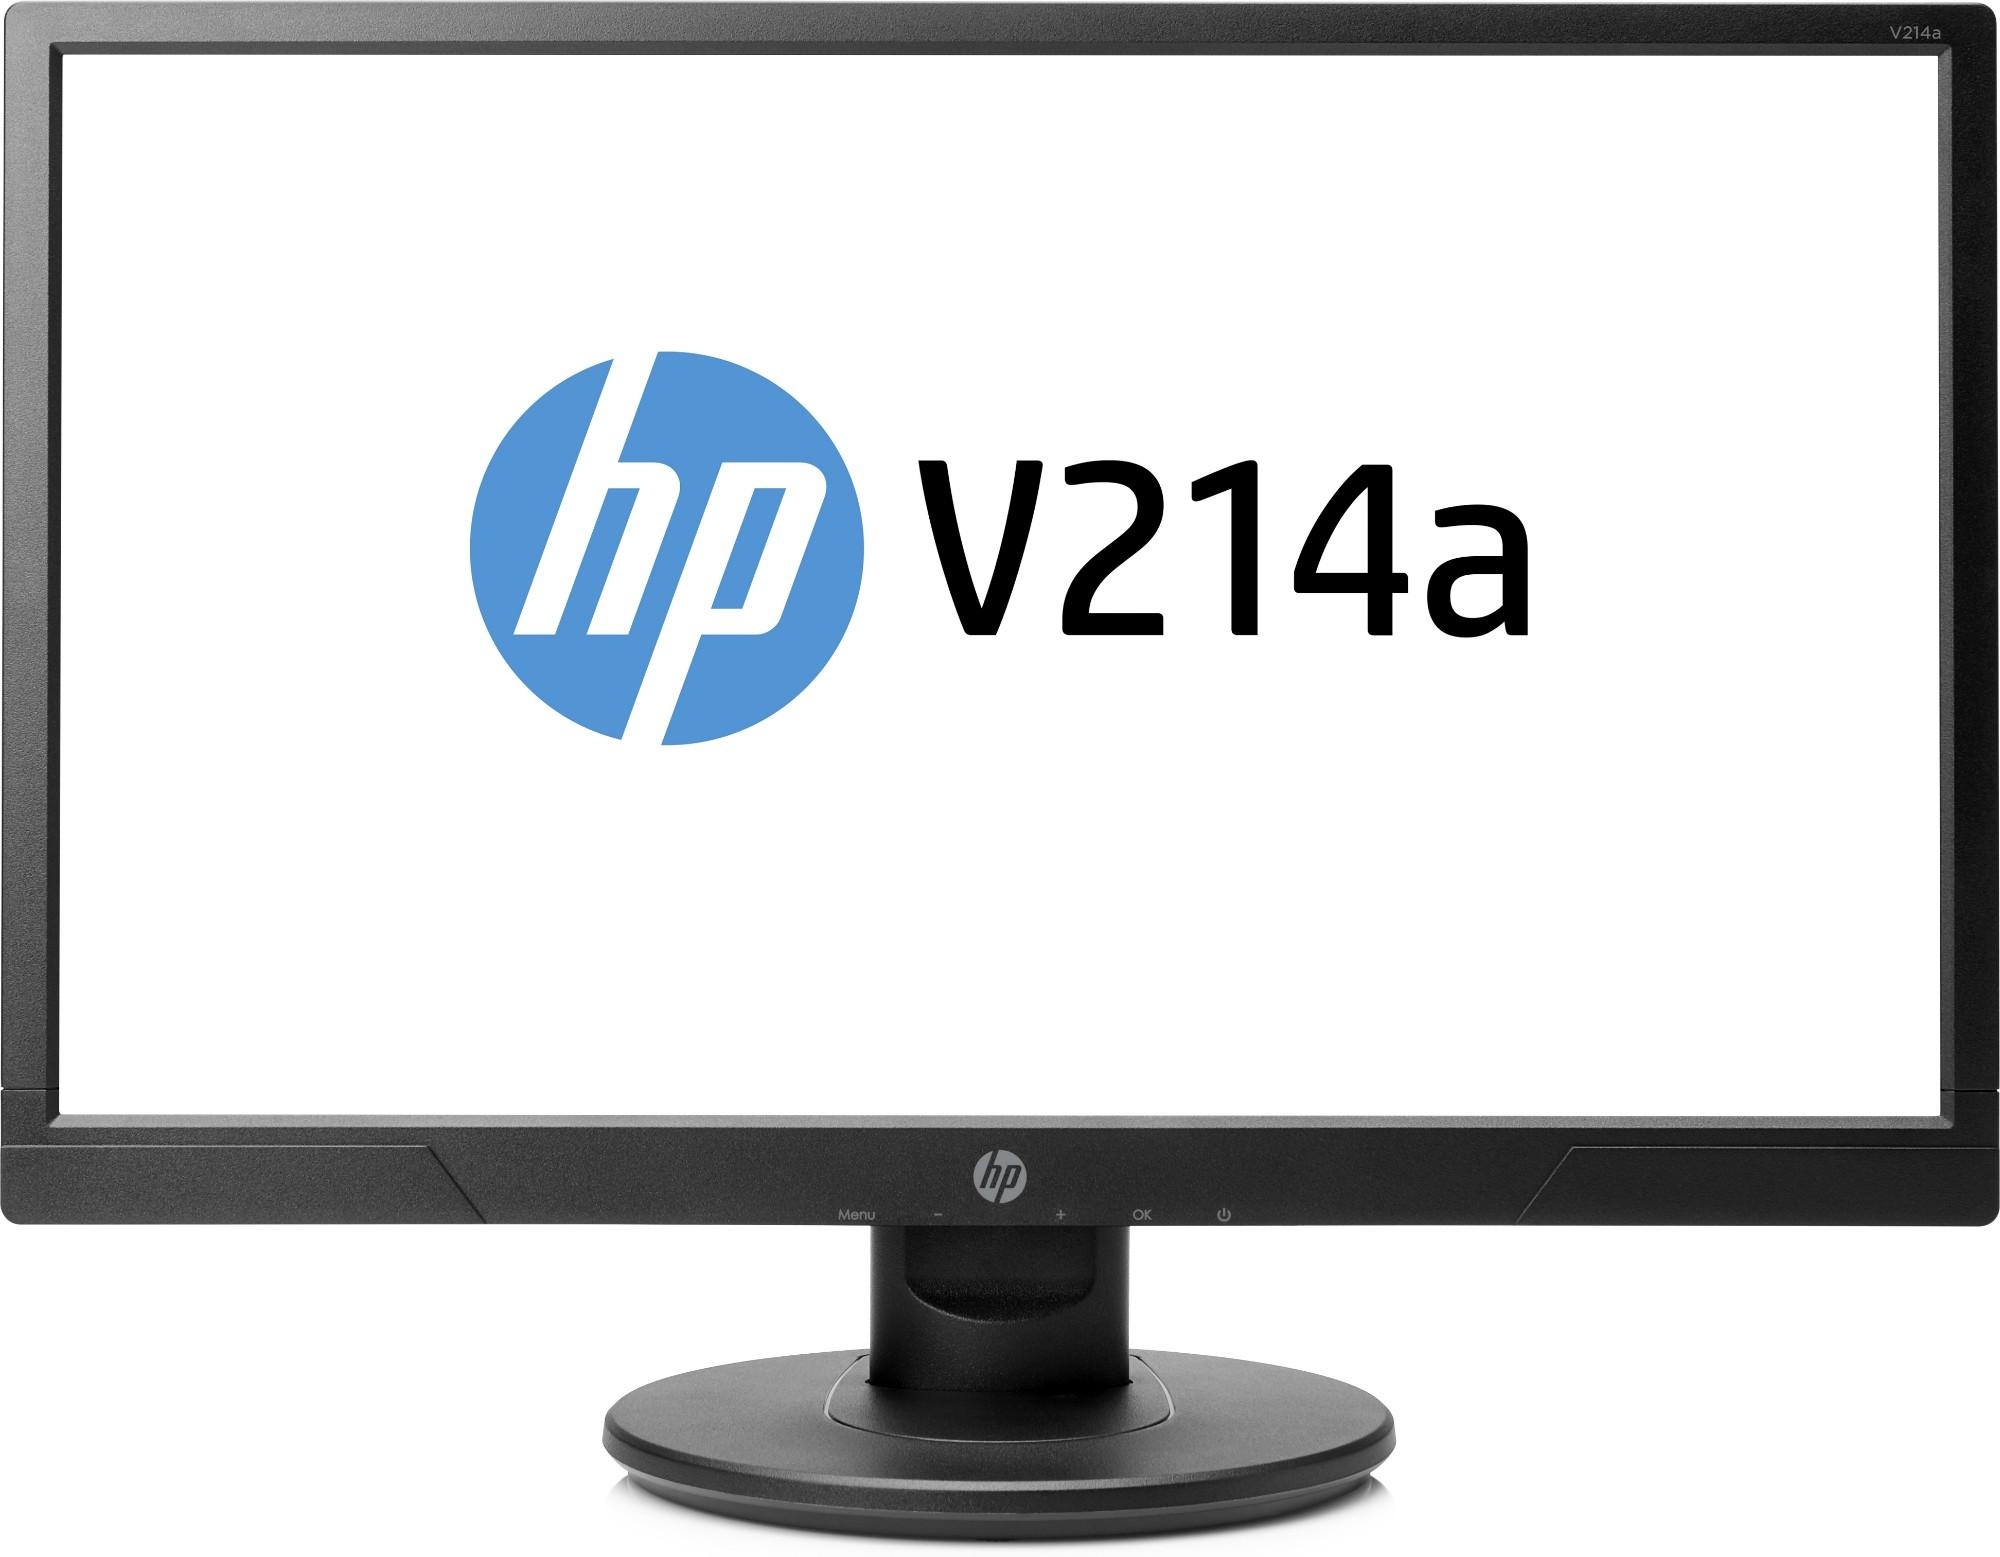 "HP V214a LED display 52.6 cm (20.7"") Full HD Flat Black"